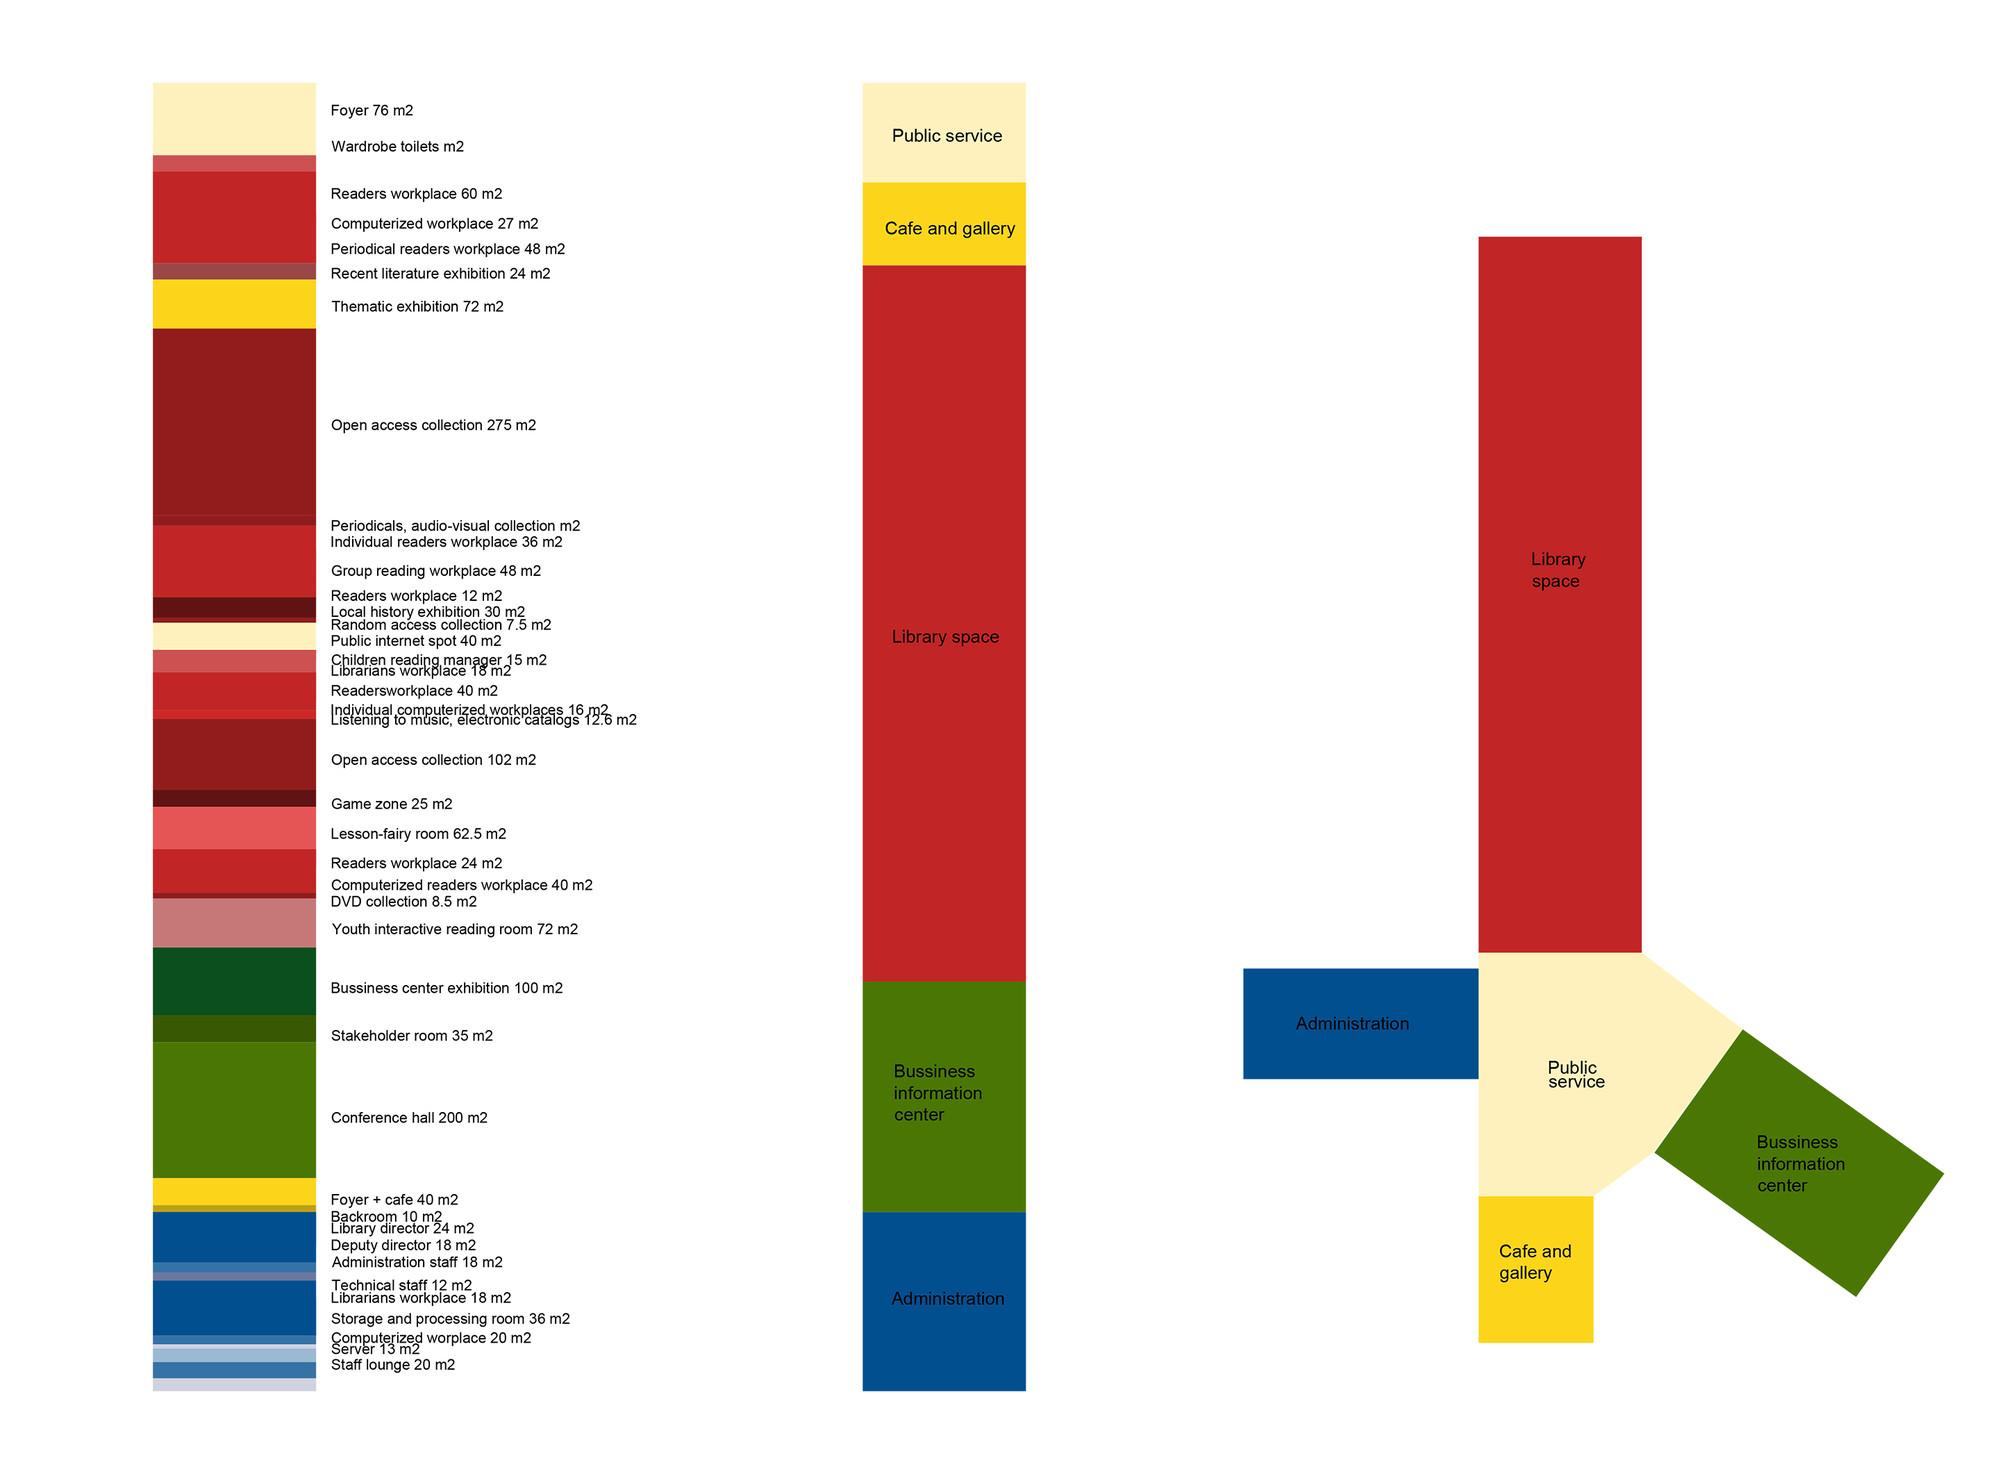 hight resolution of library building in bauska winning proposal program diagram 01